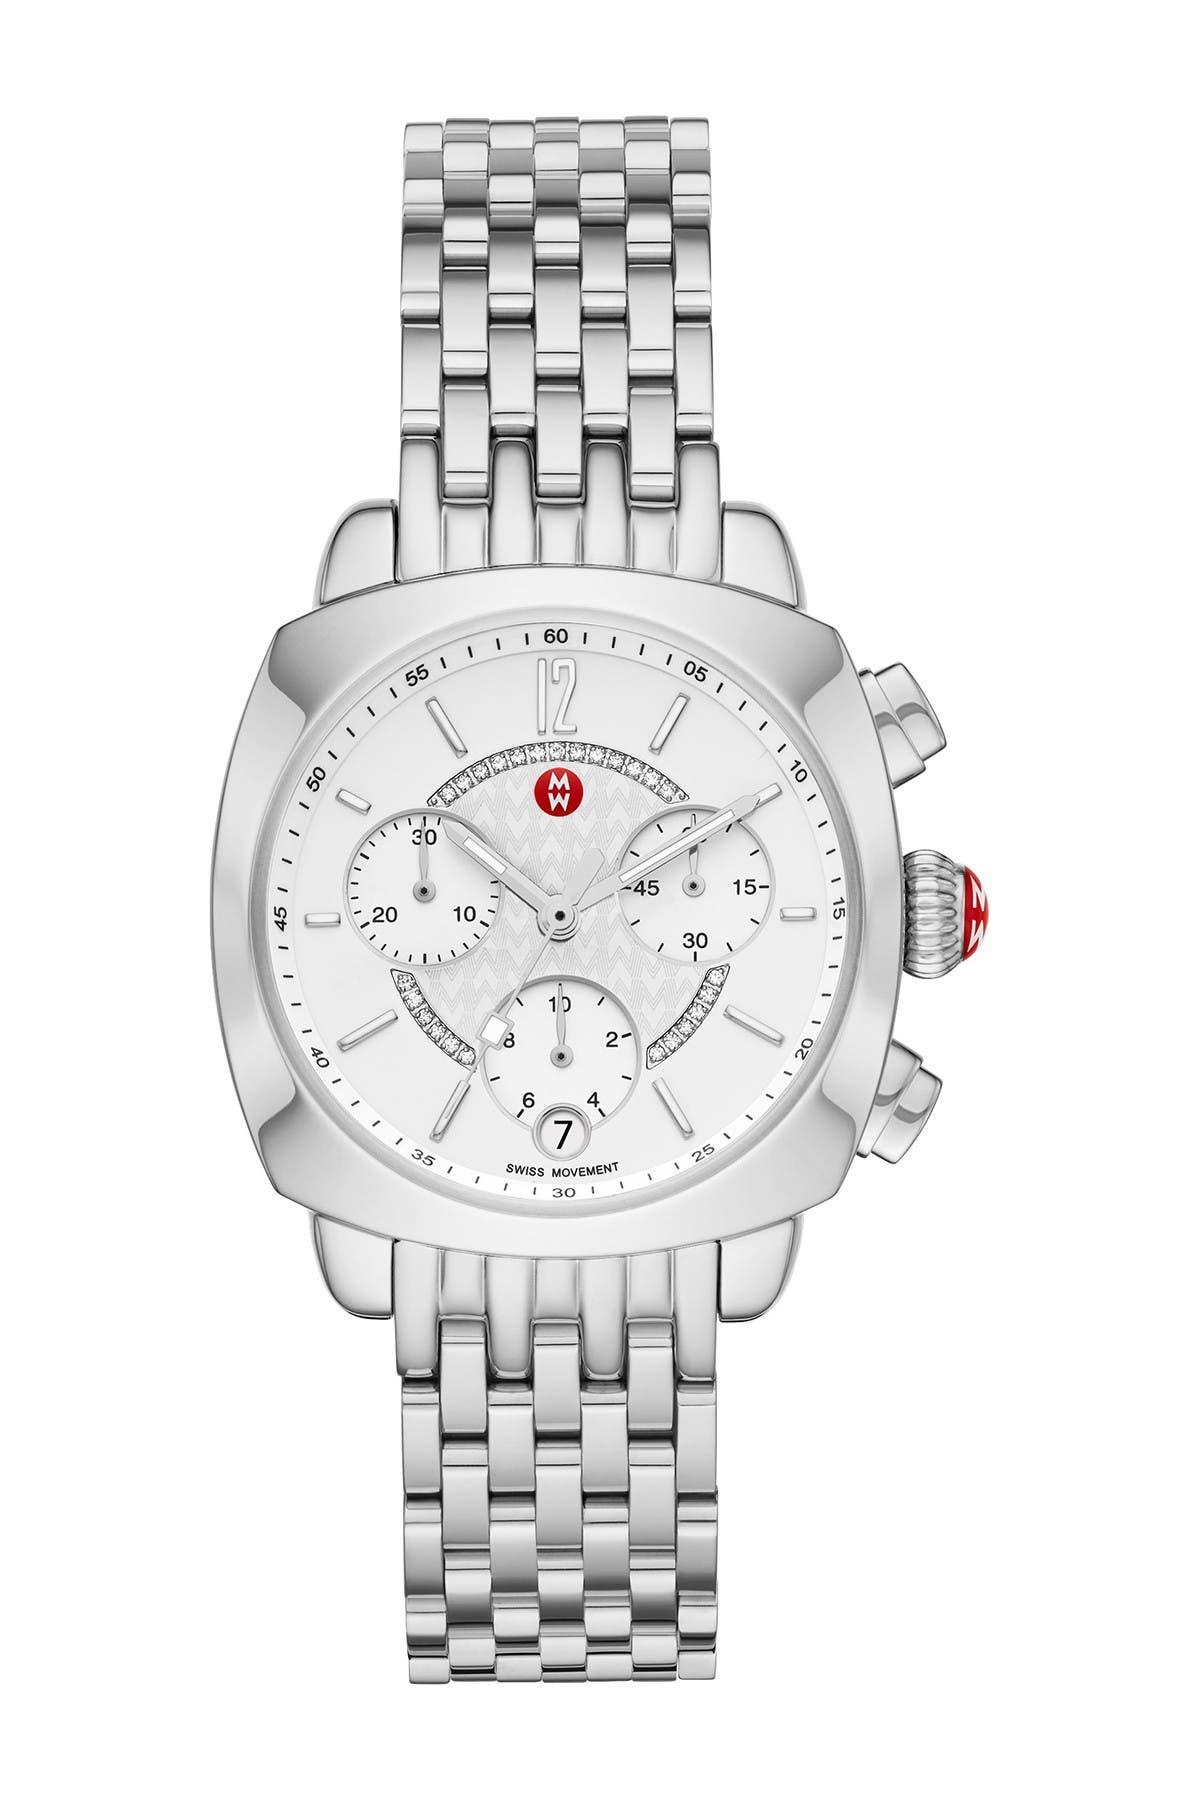 Image of Michele Women's Ascalon Diamond Bracelet Watch, 34mm x 41mm - 0.05 ctw